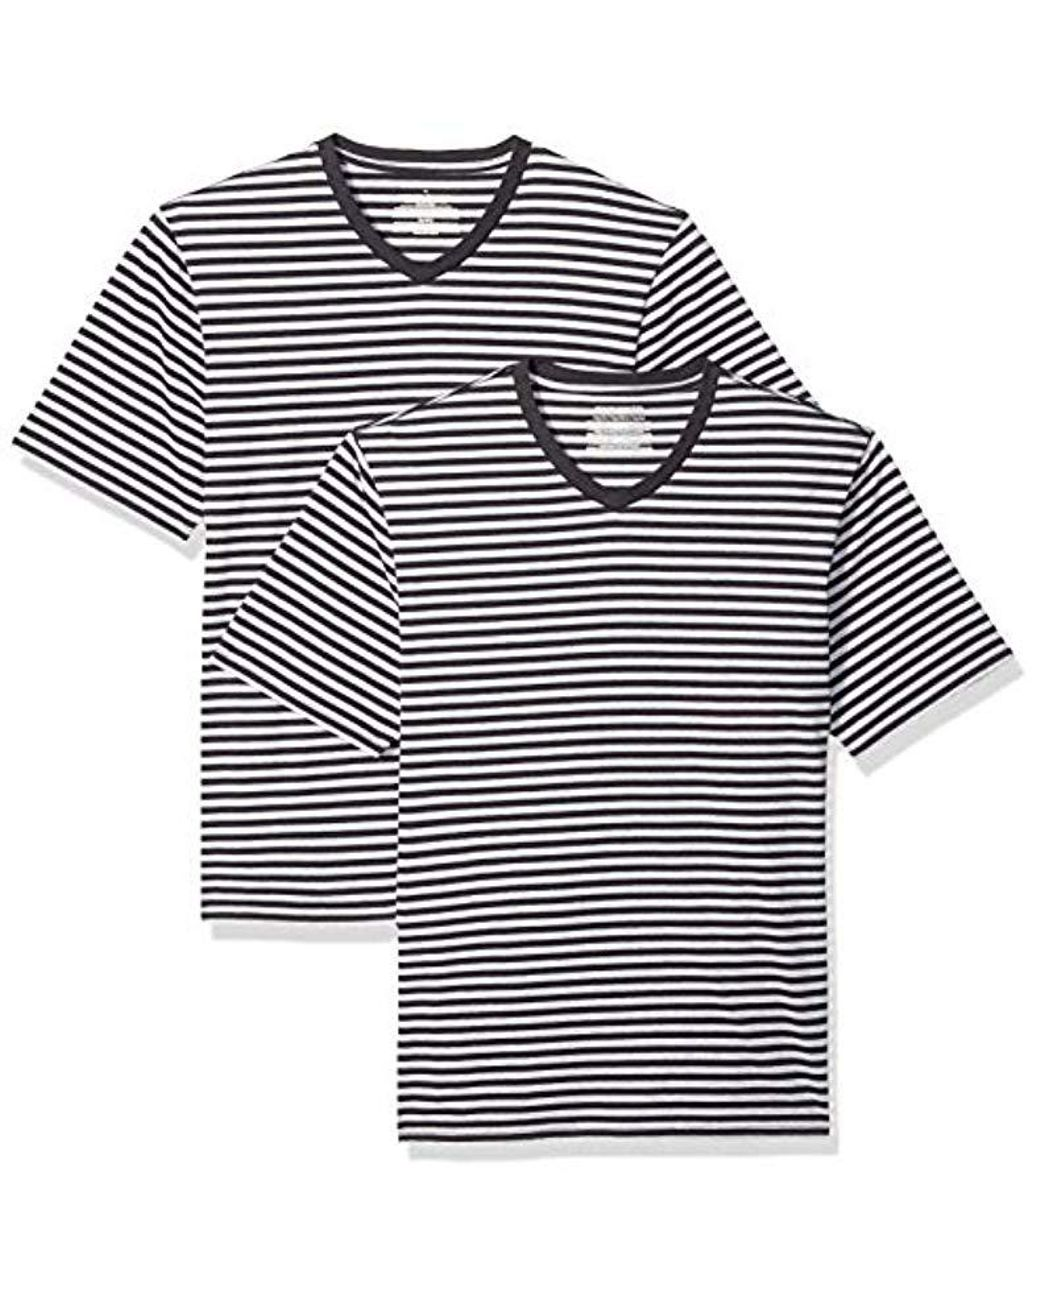 1c1c113c4a Amazon Essentials. Men's Black Loose-fit Short-sleeve Stripe V-neck T-shirts